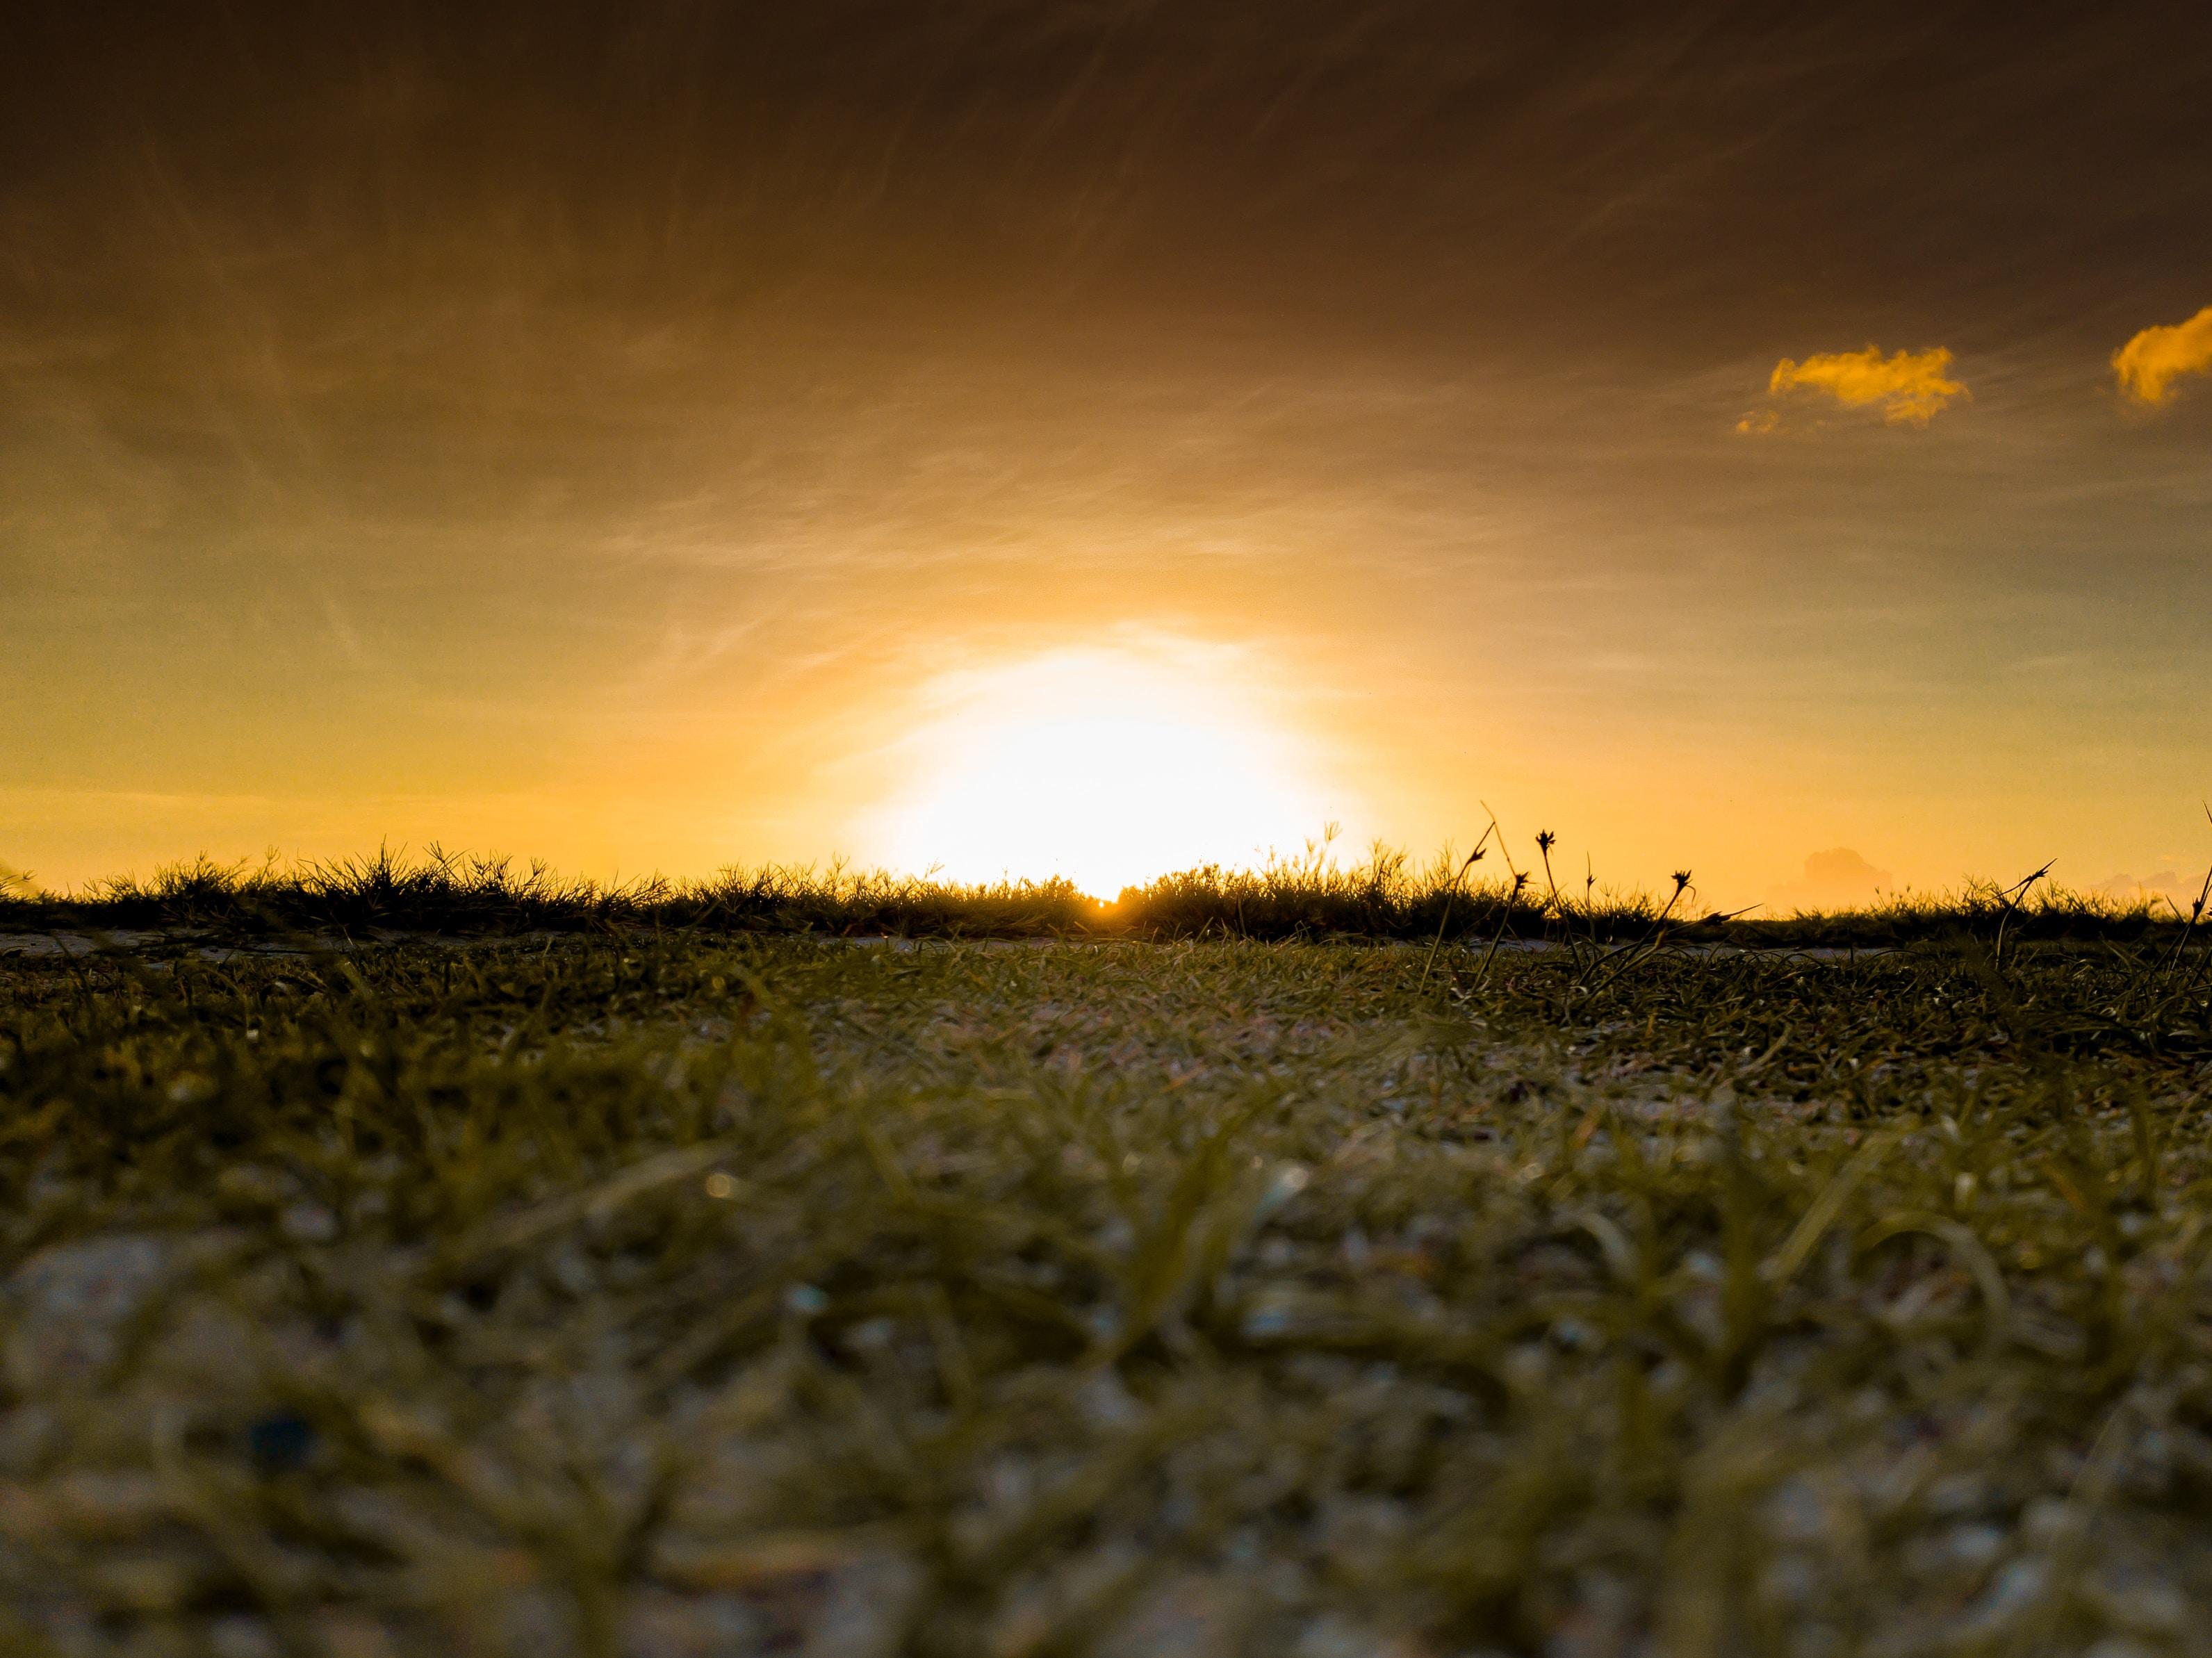 green grass lawn during sunset